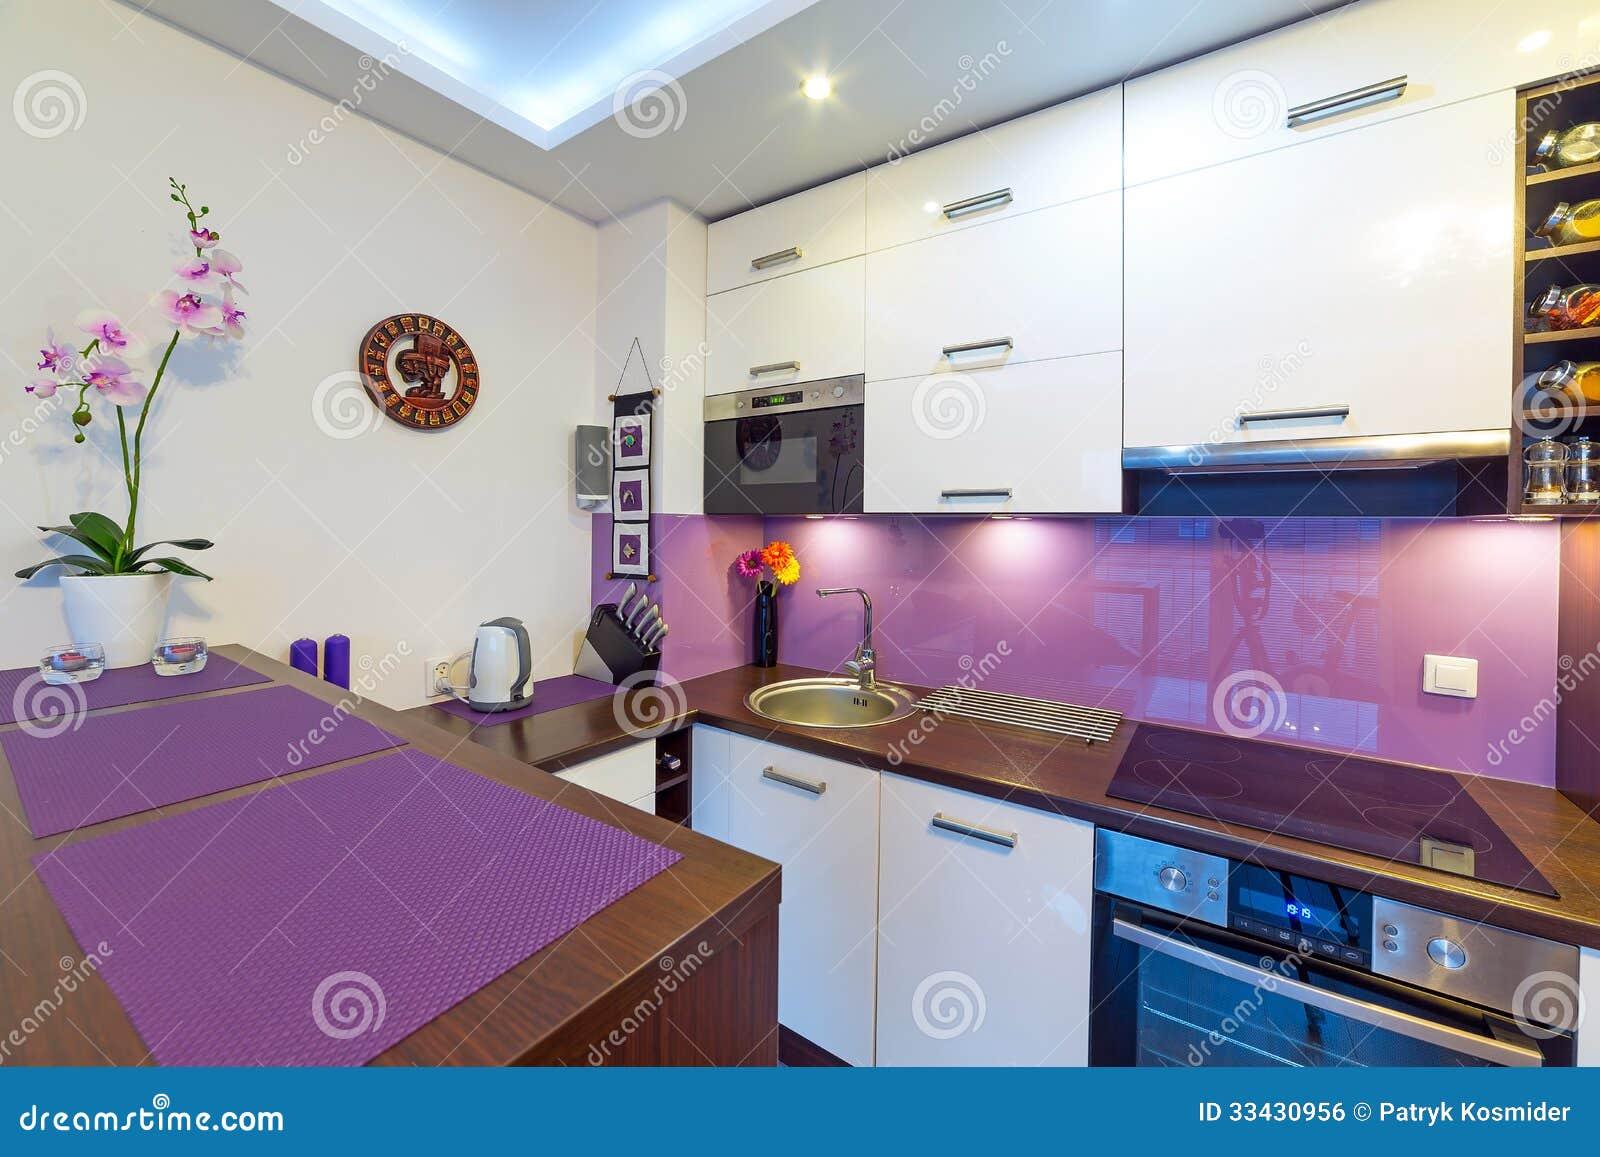 modern purple kitchen interior royalty free stock photo - image